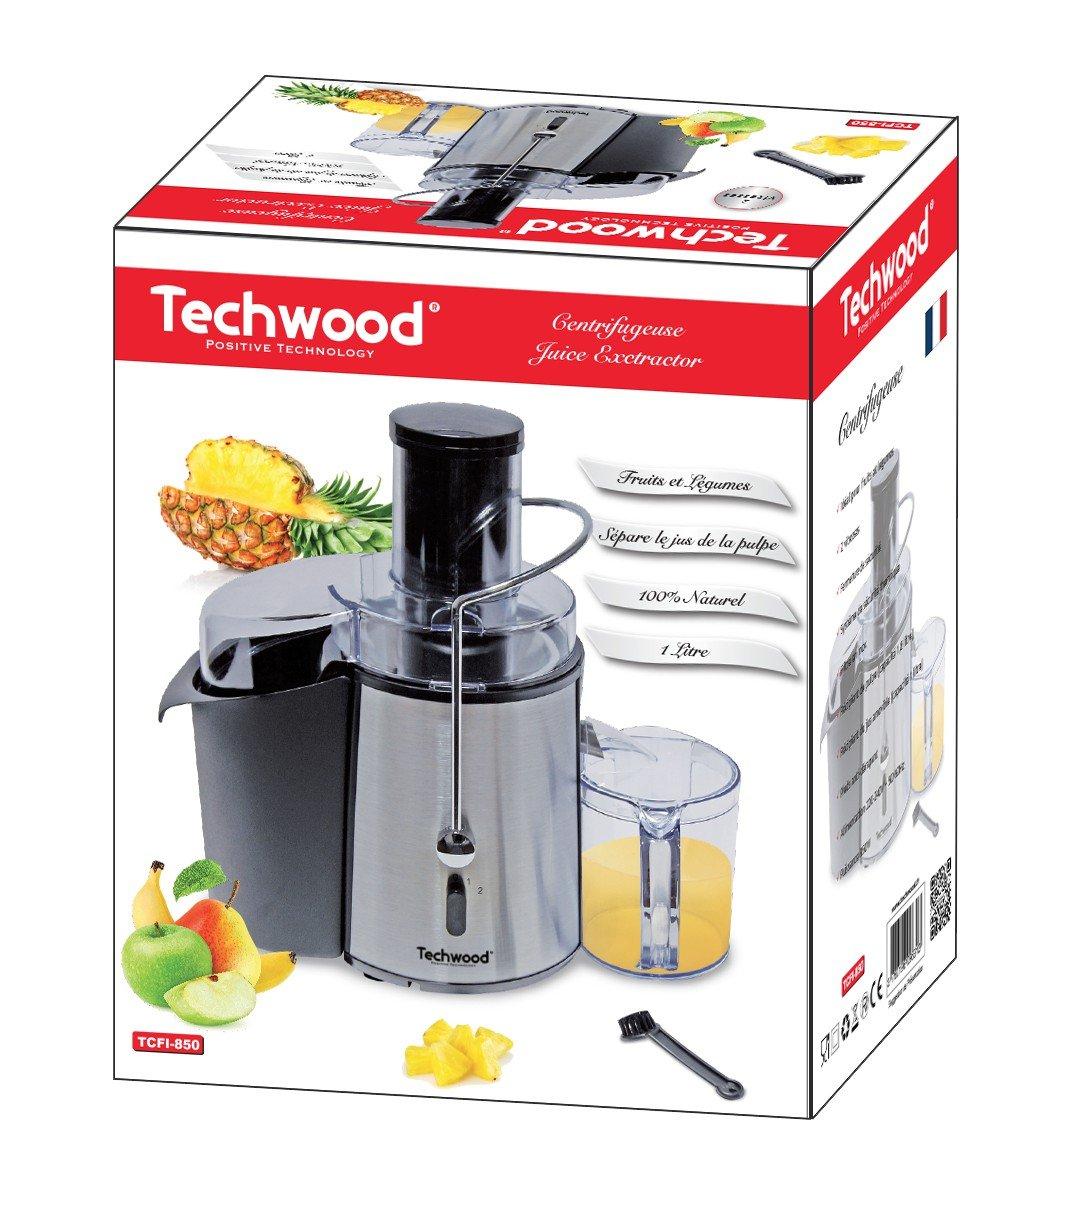 Techwood TCFI-850-Exprimidor de acero inoxidable: Amazon.es: Hogar